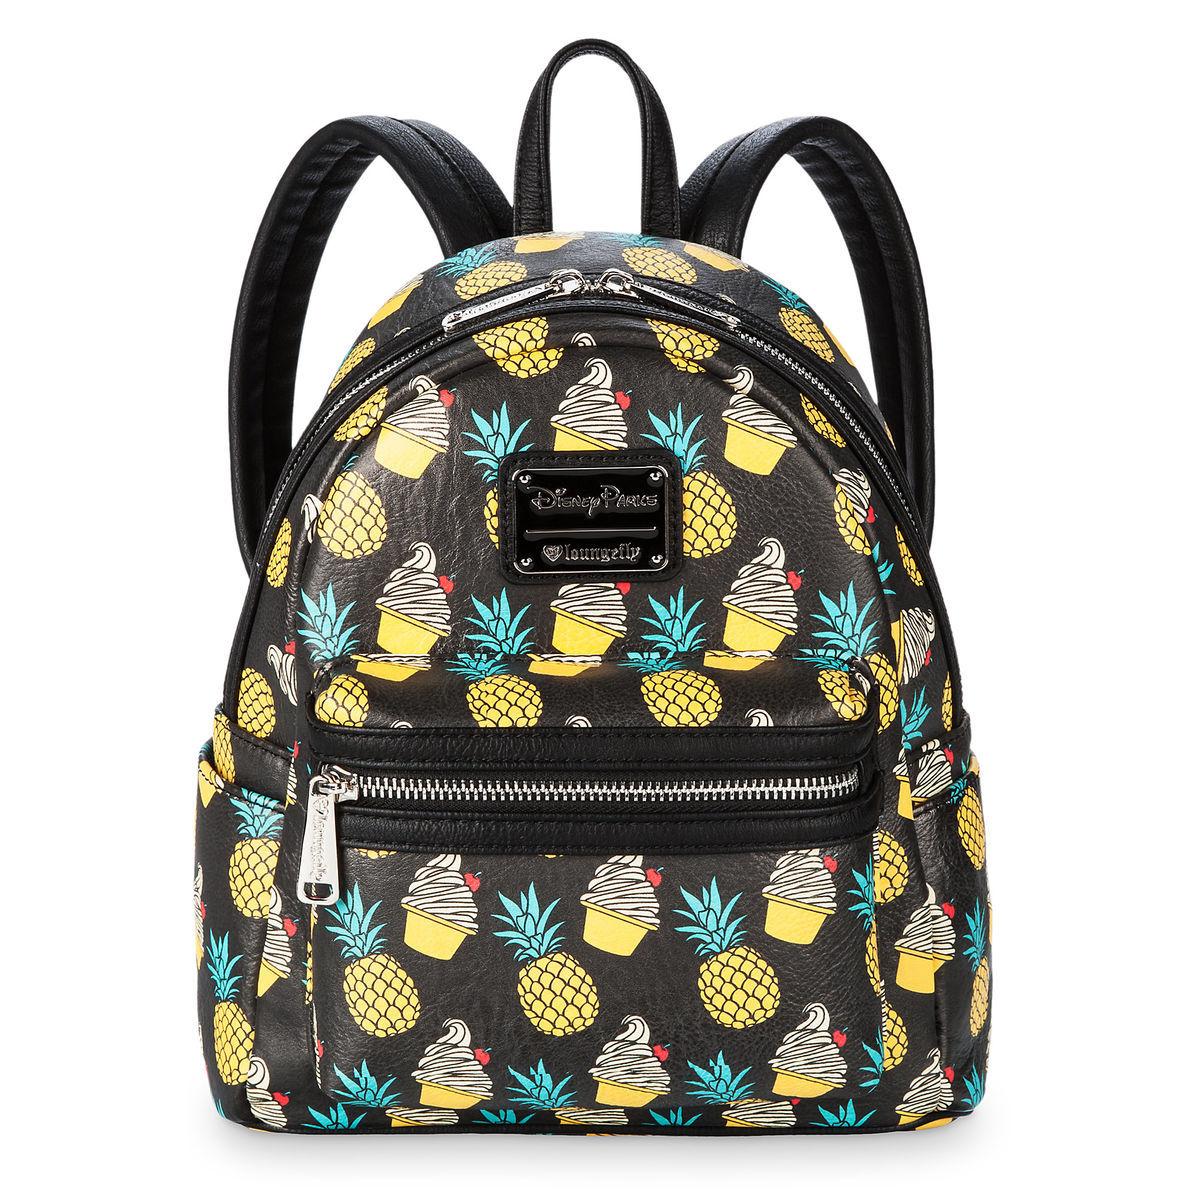 Disney Loungefly Backpack - Pineapple Dole Whip - Mini